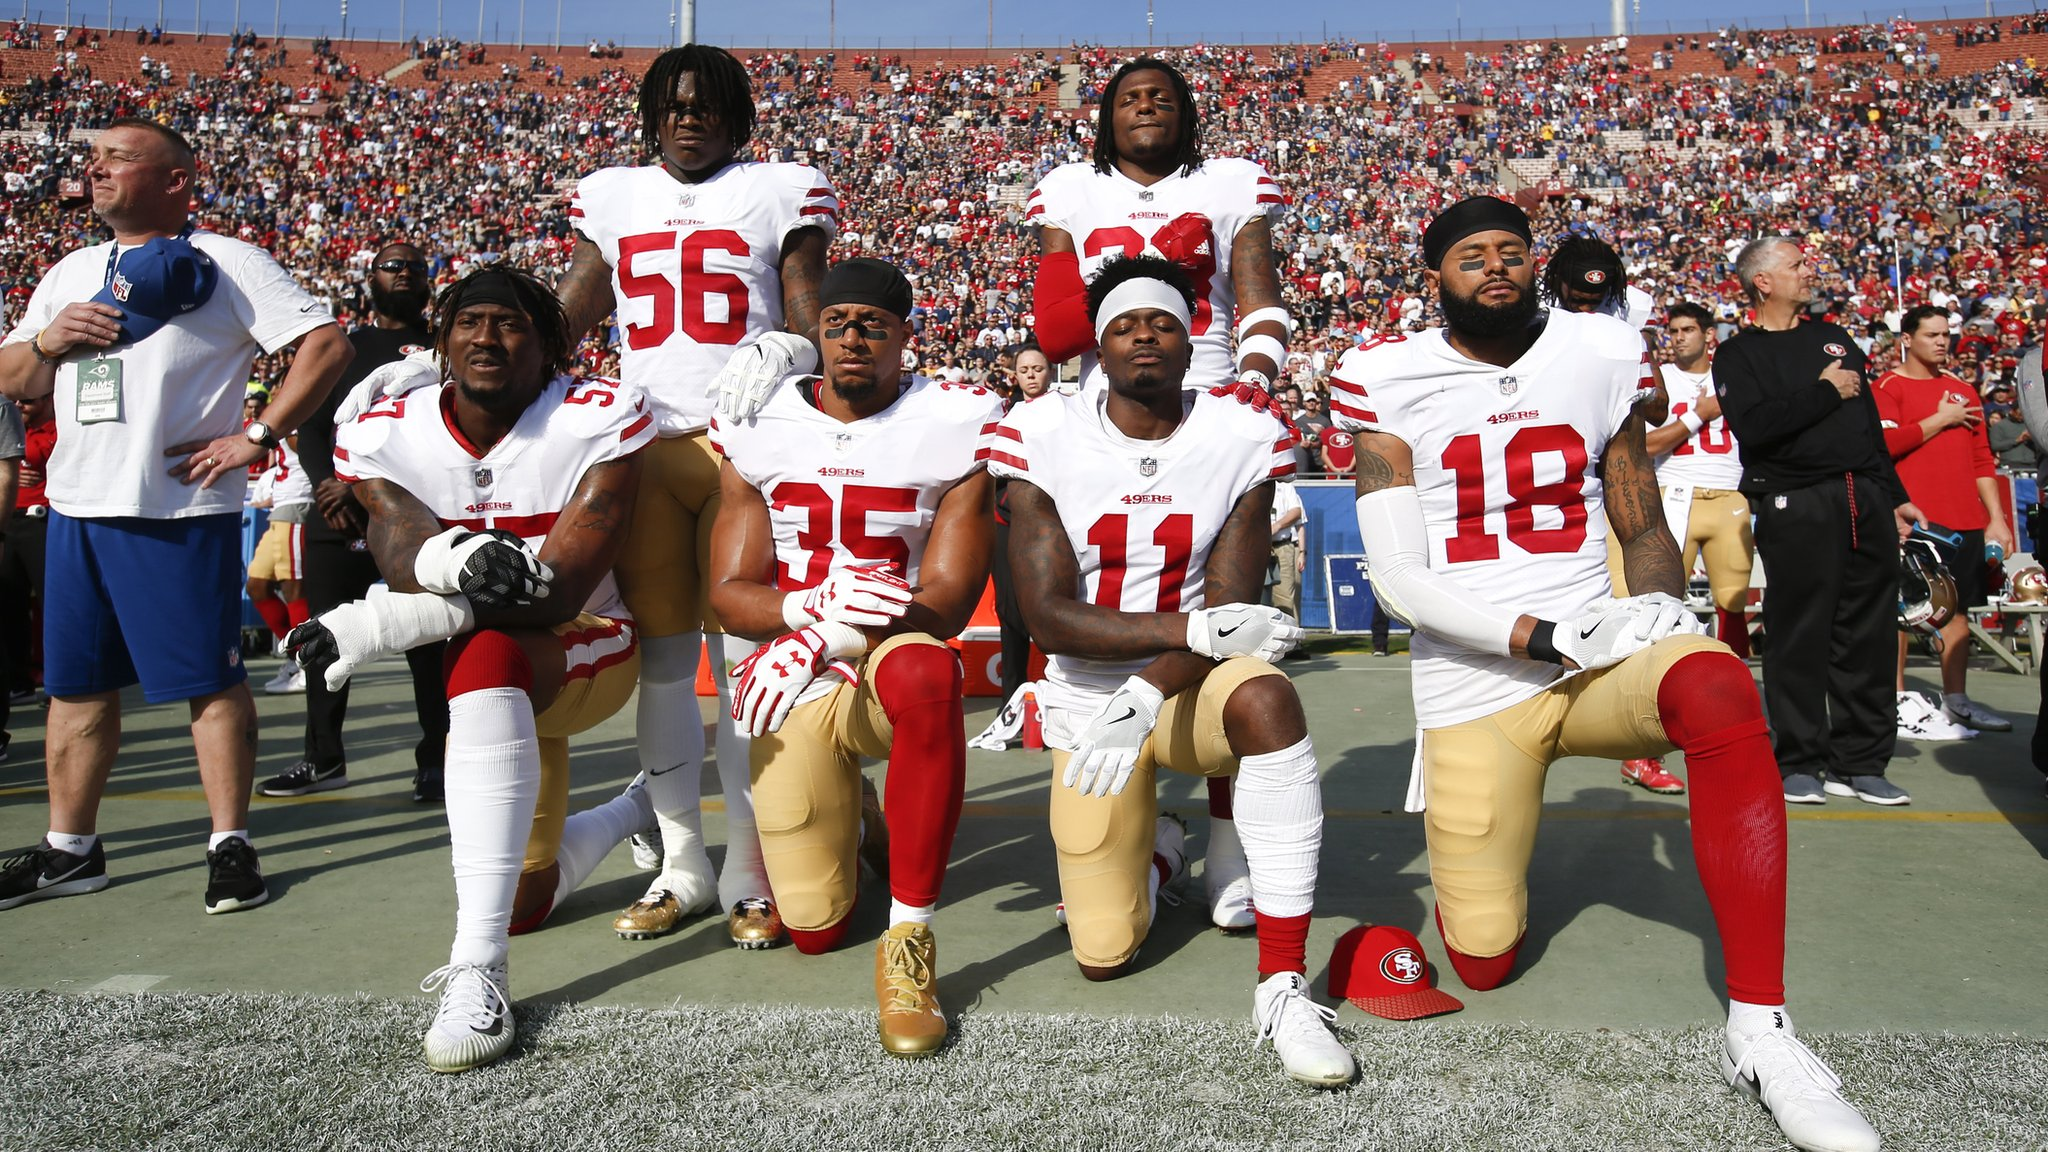 Trump calls for season-long NFL bans for kneeling